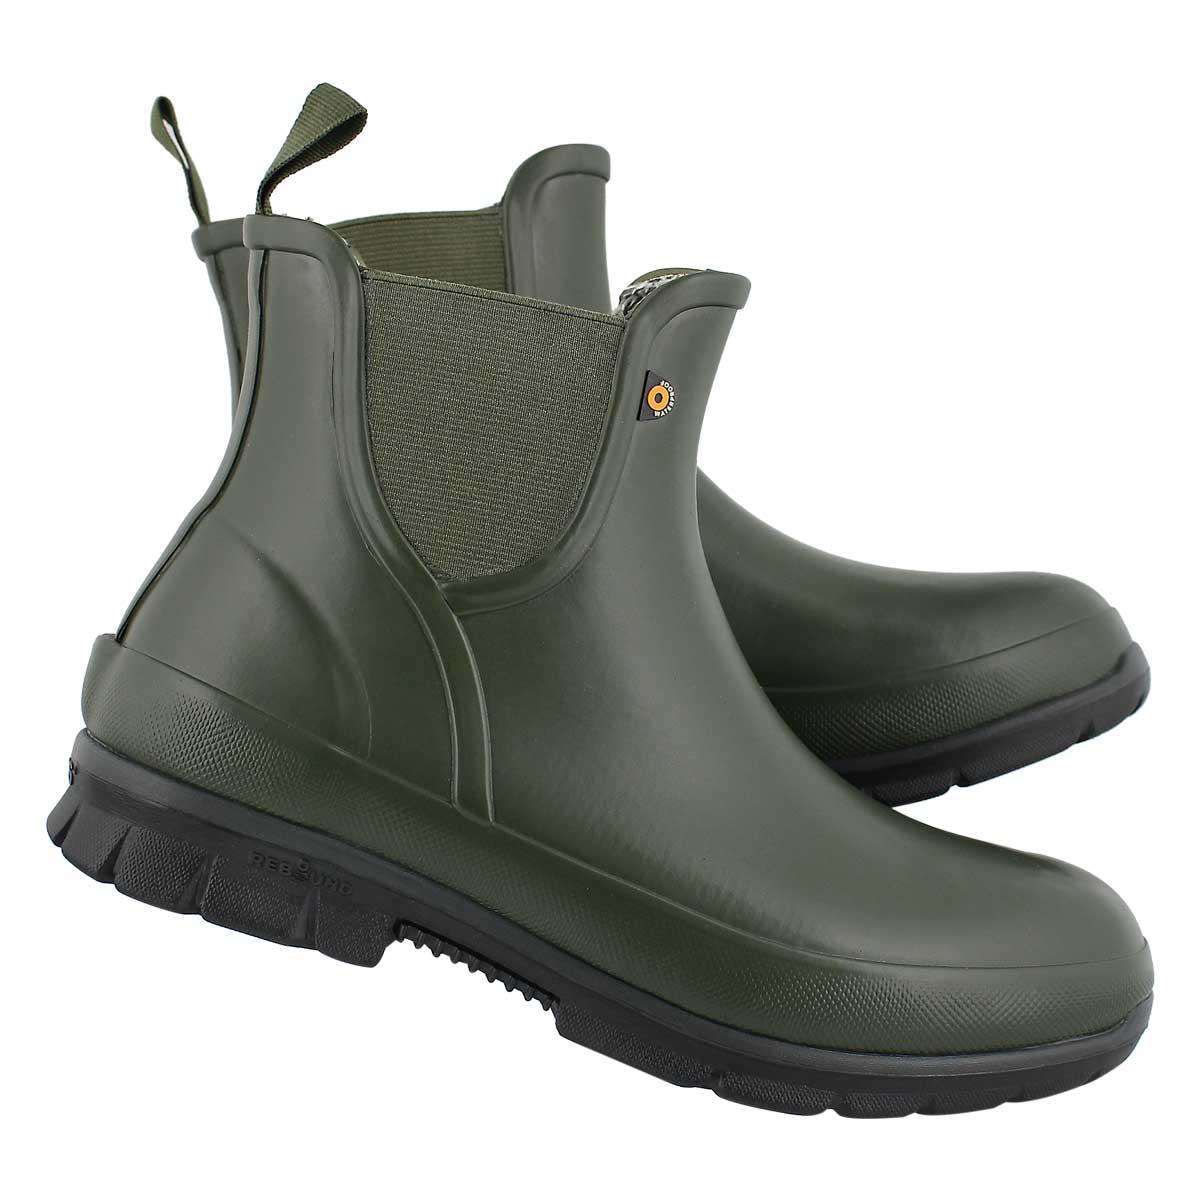 Lds Amanda Plush dkgrn wtpf chelsea boot